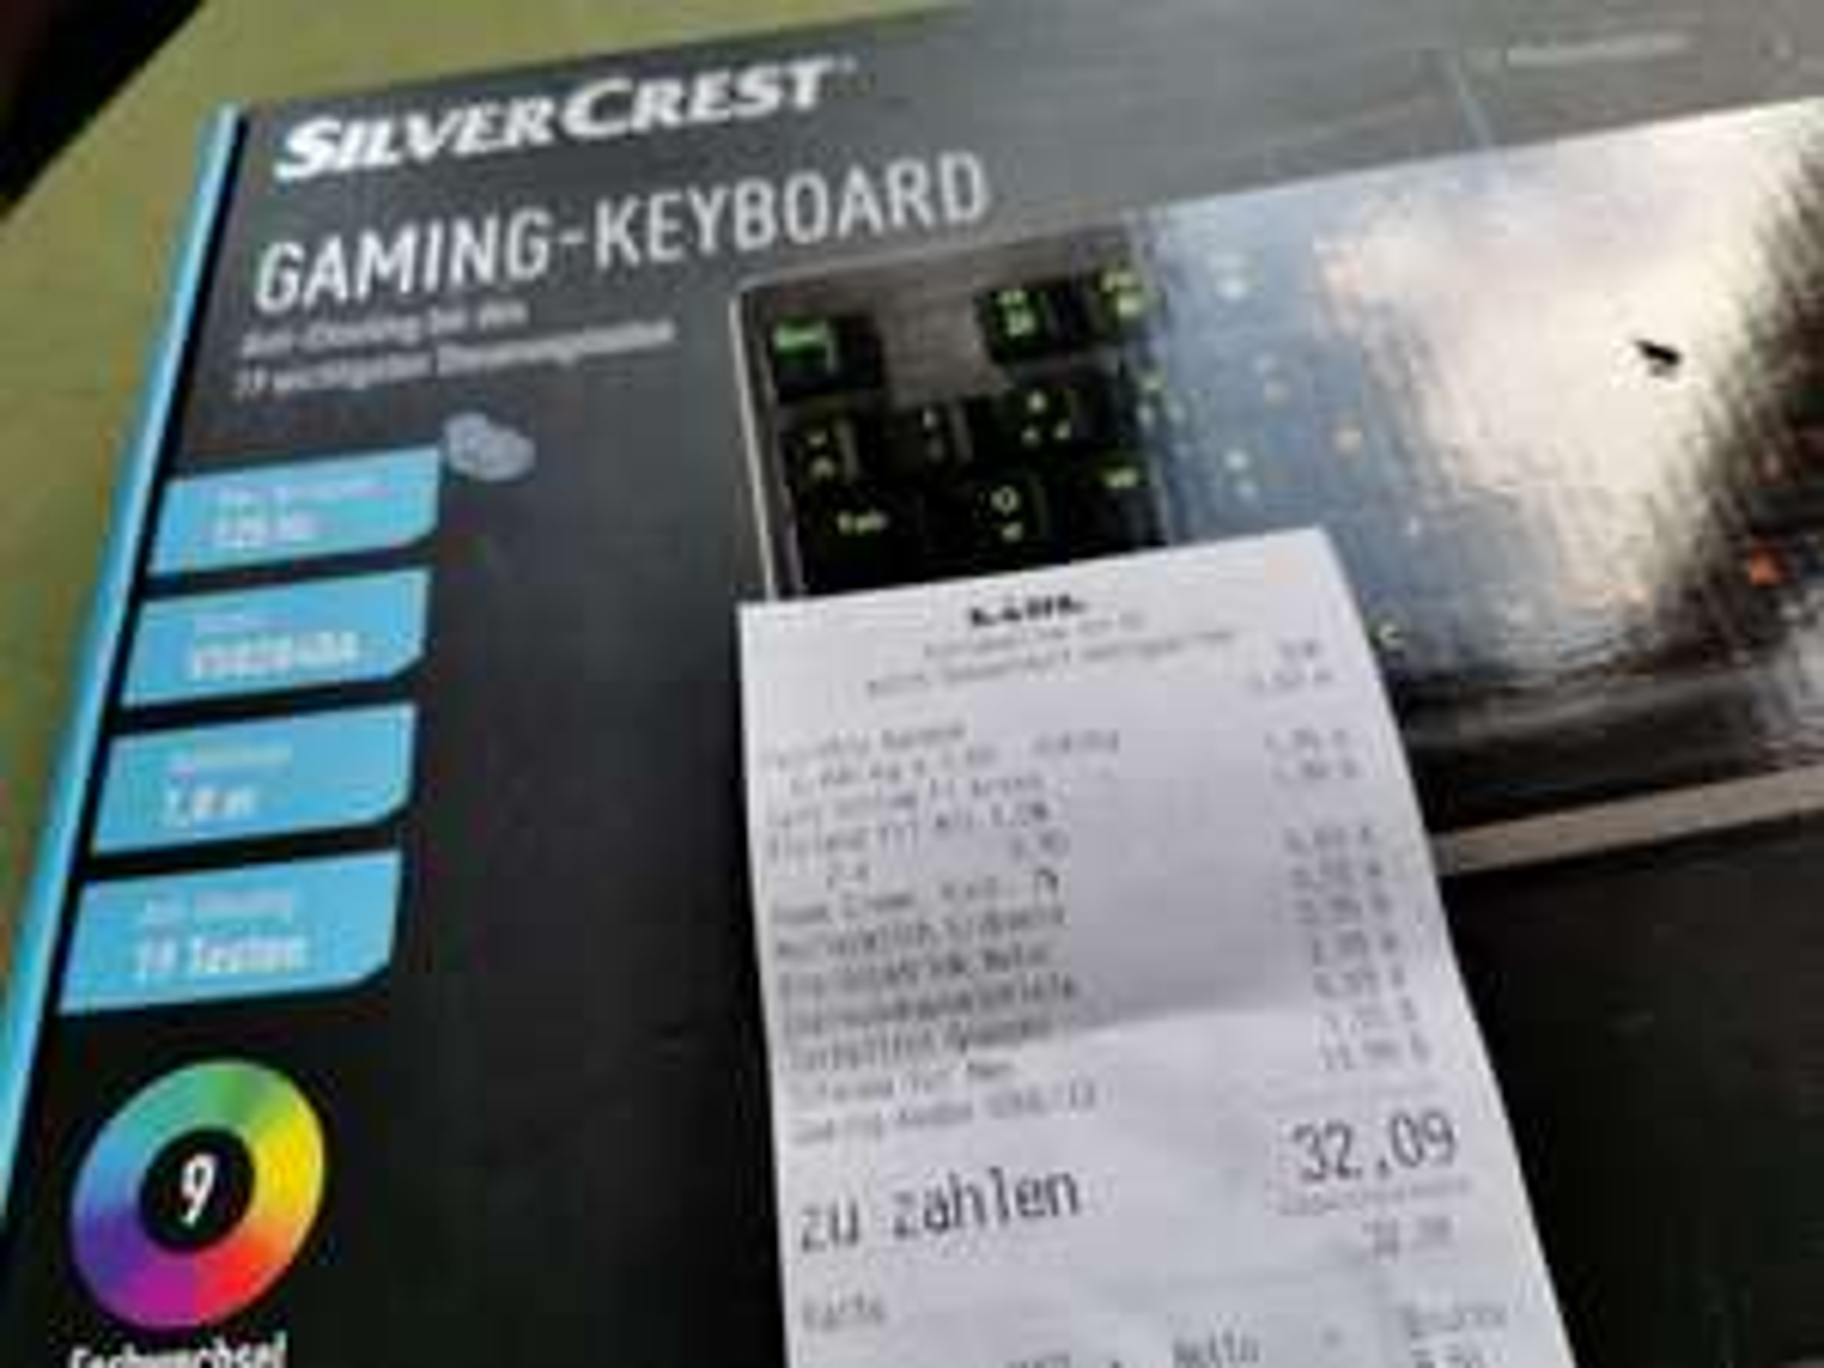 [Lokal: Lidl Düsseldorf Königsallee] Gaming Keyboard Silvercrest  semi-mechanische Tastatur